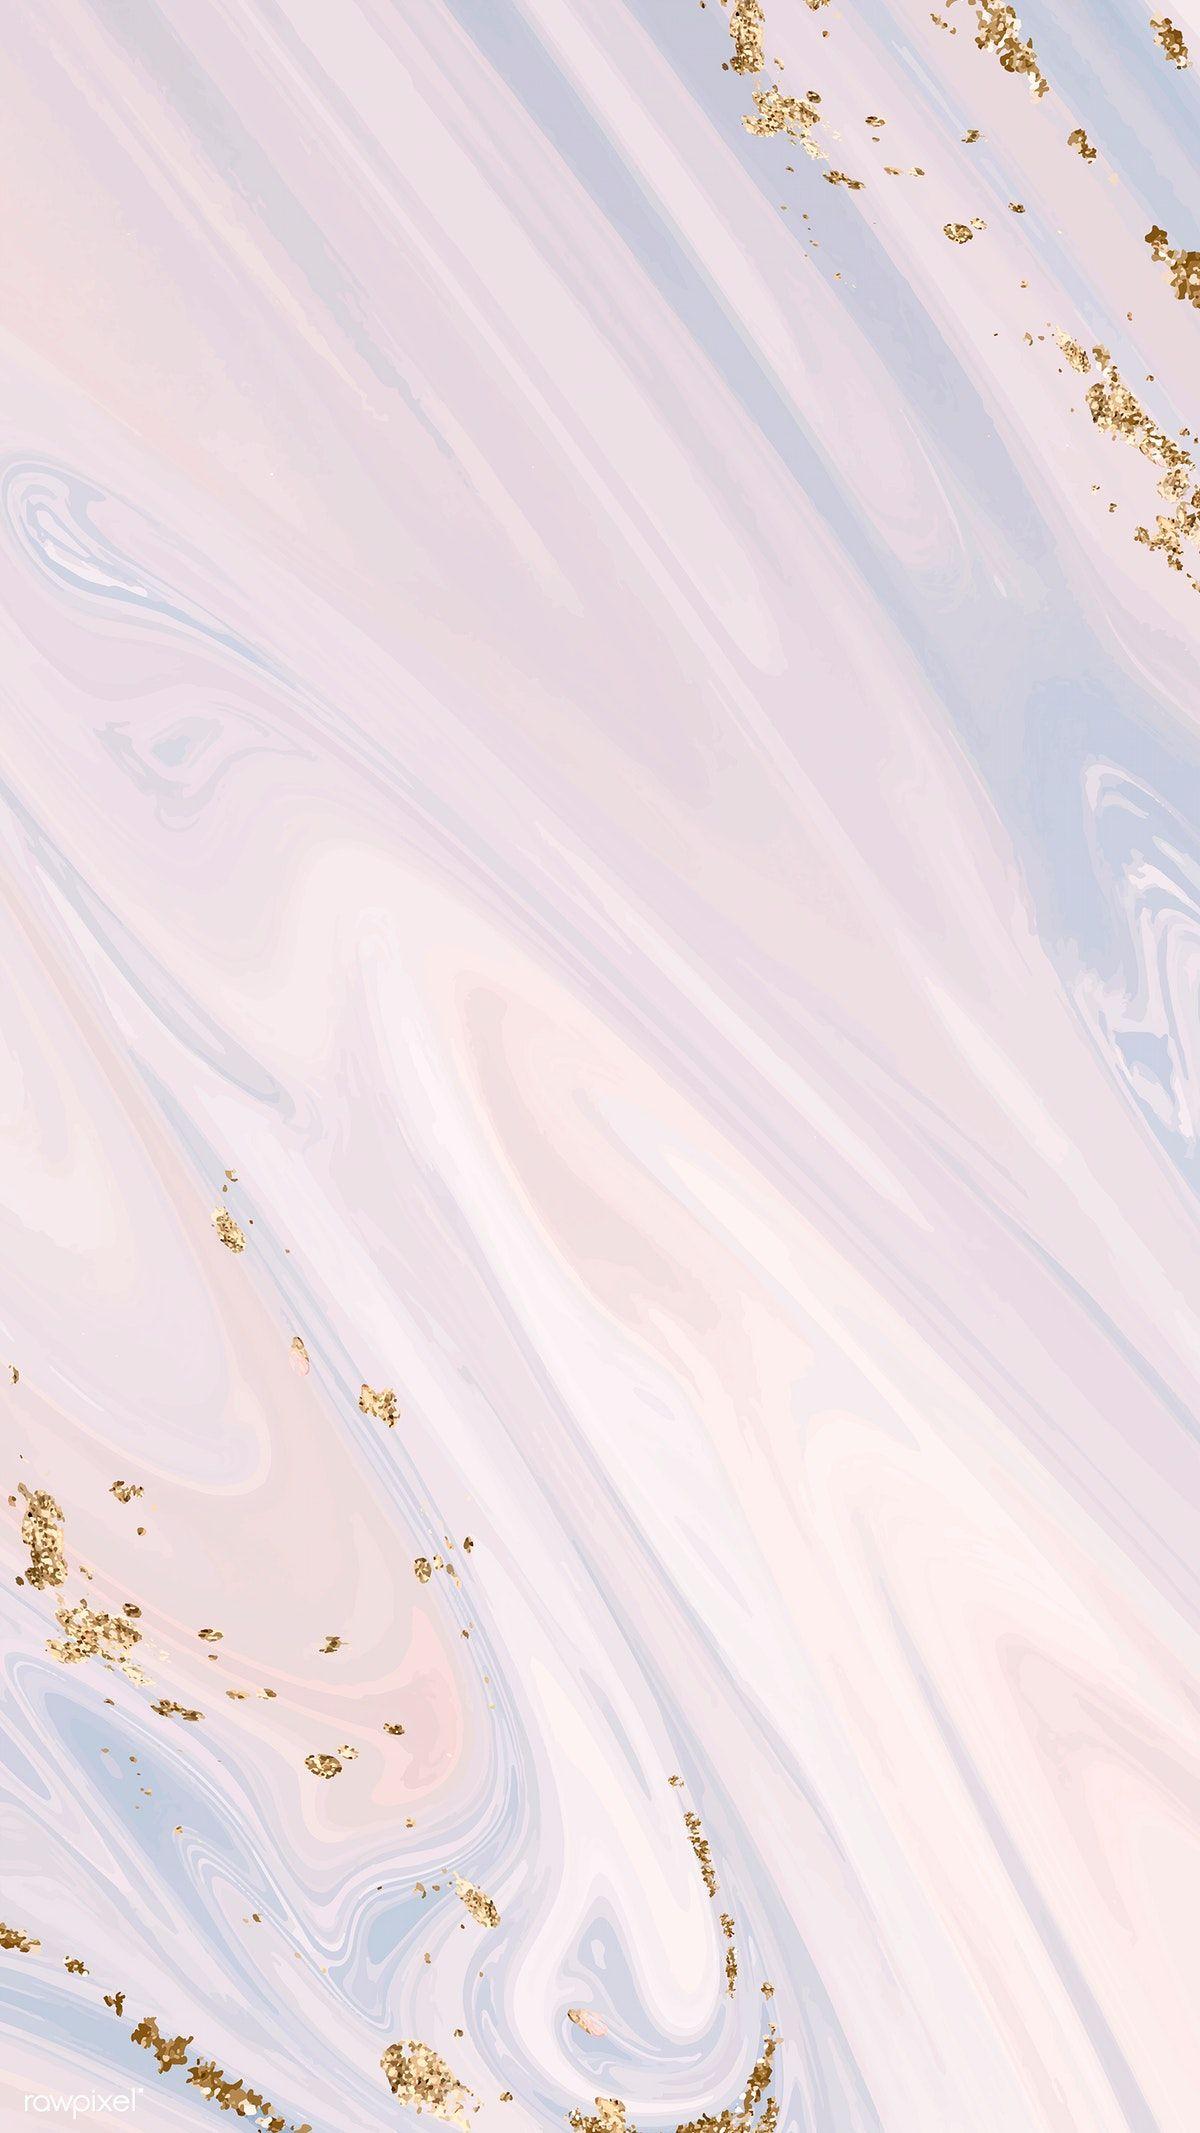 Download Premium Vector Of Pink Fluid Patterned Background Vector 1219737 Gold Wallpaper Background Pastel Background Wallpapers Rose Gold Wallpaper